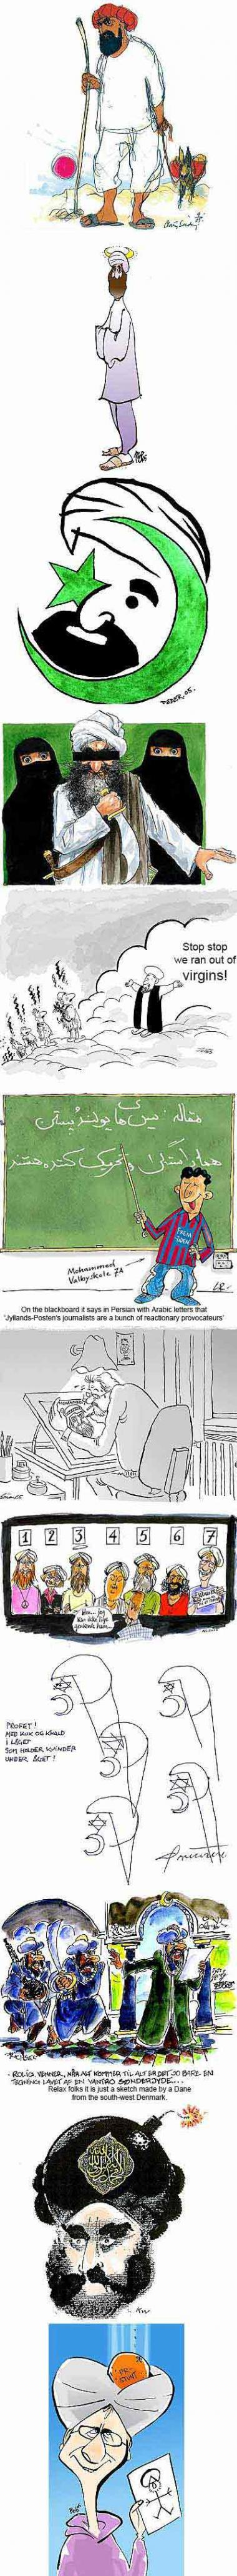 Controversial Muslim Cartoons